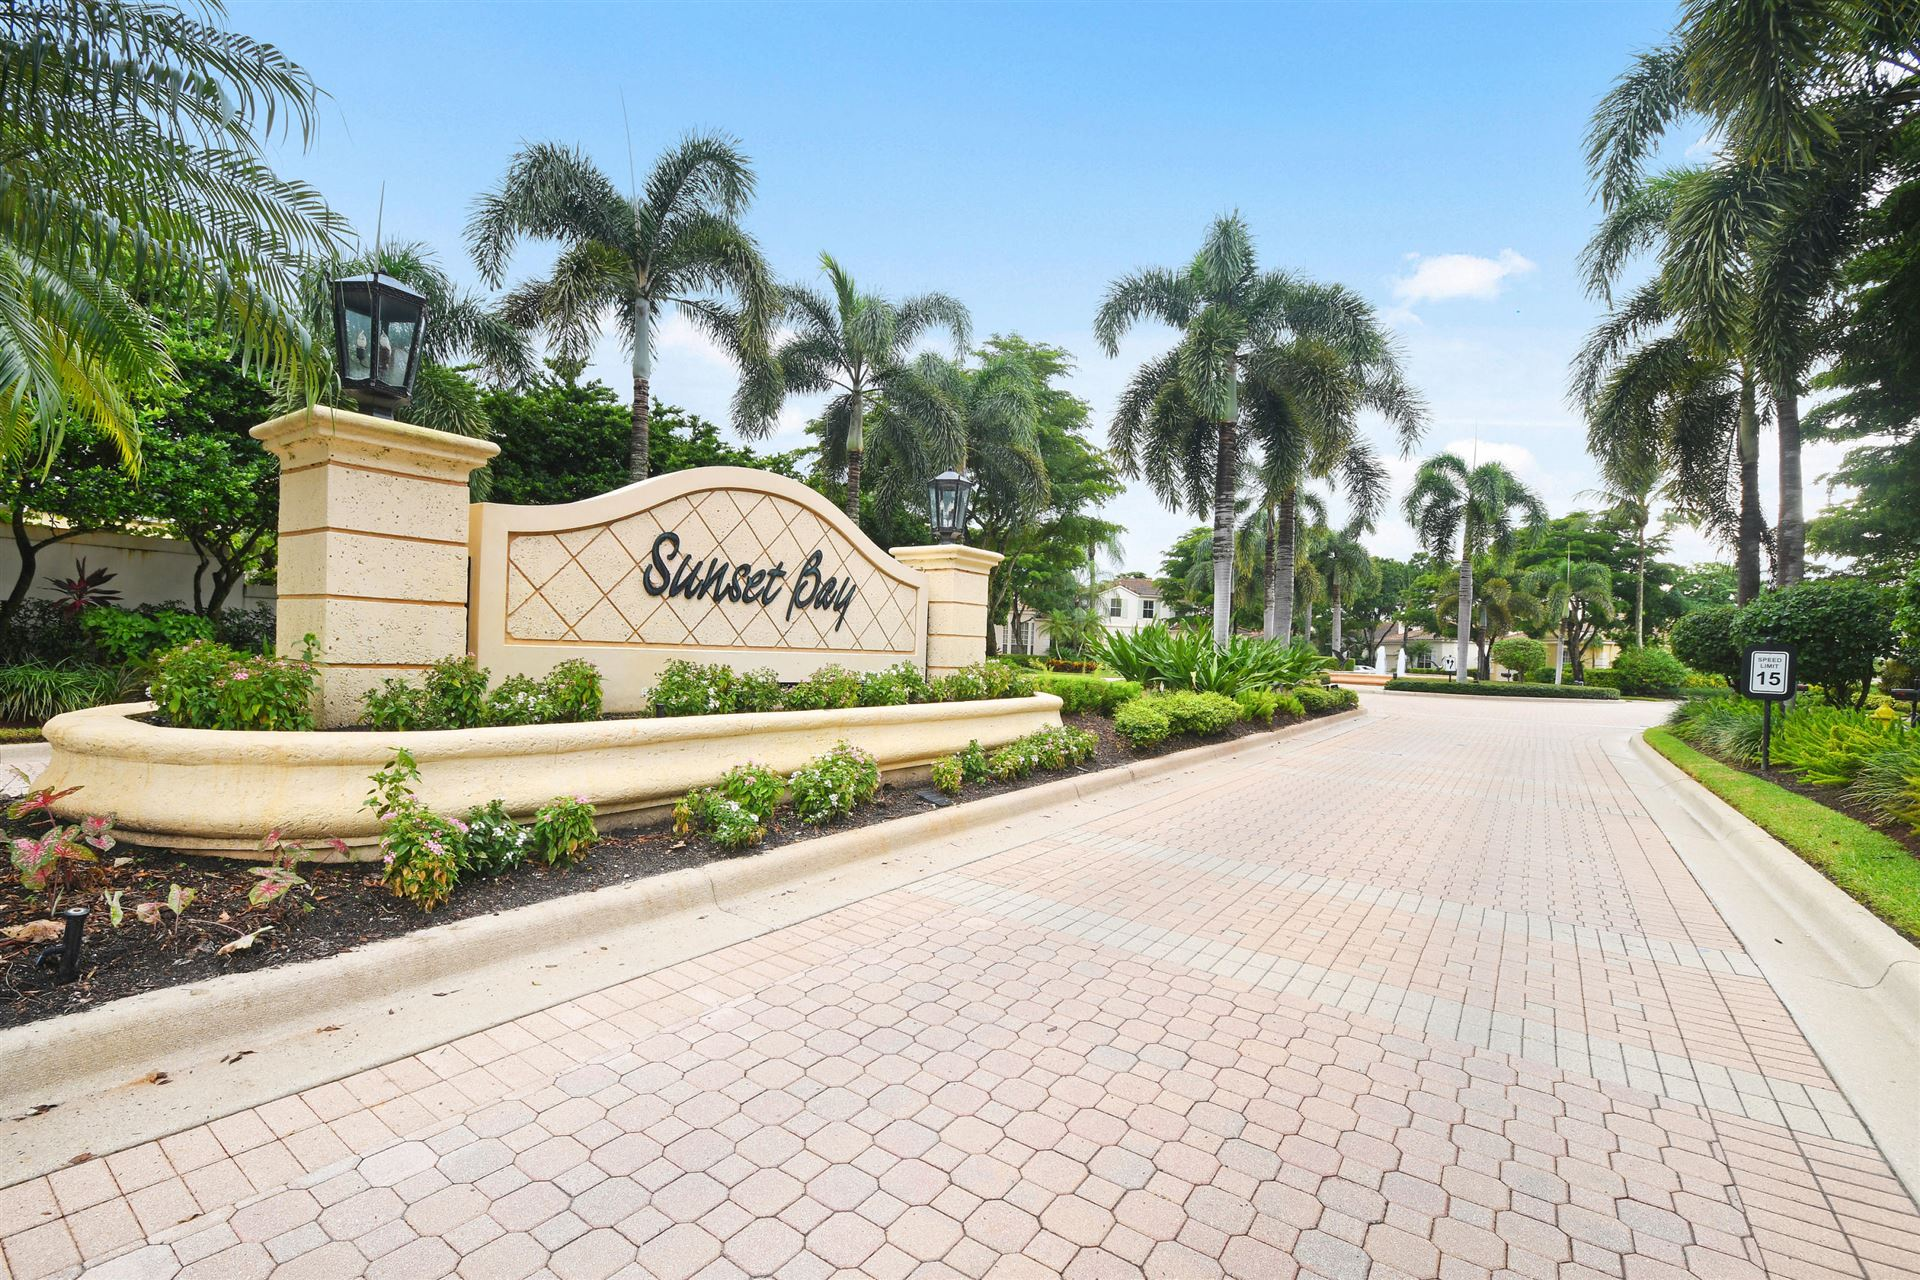 Photo of 102 Sunset Bay Drive, Palm Beach Gardens, FL 33418 (MLS # RX-10664001)